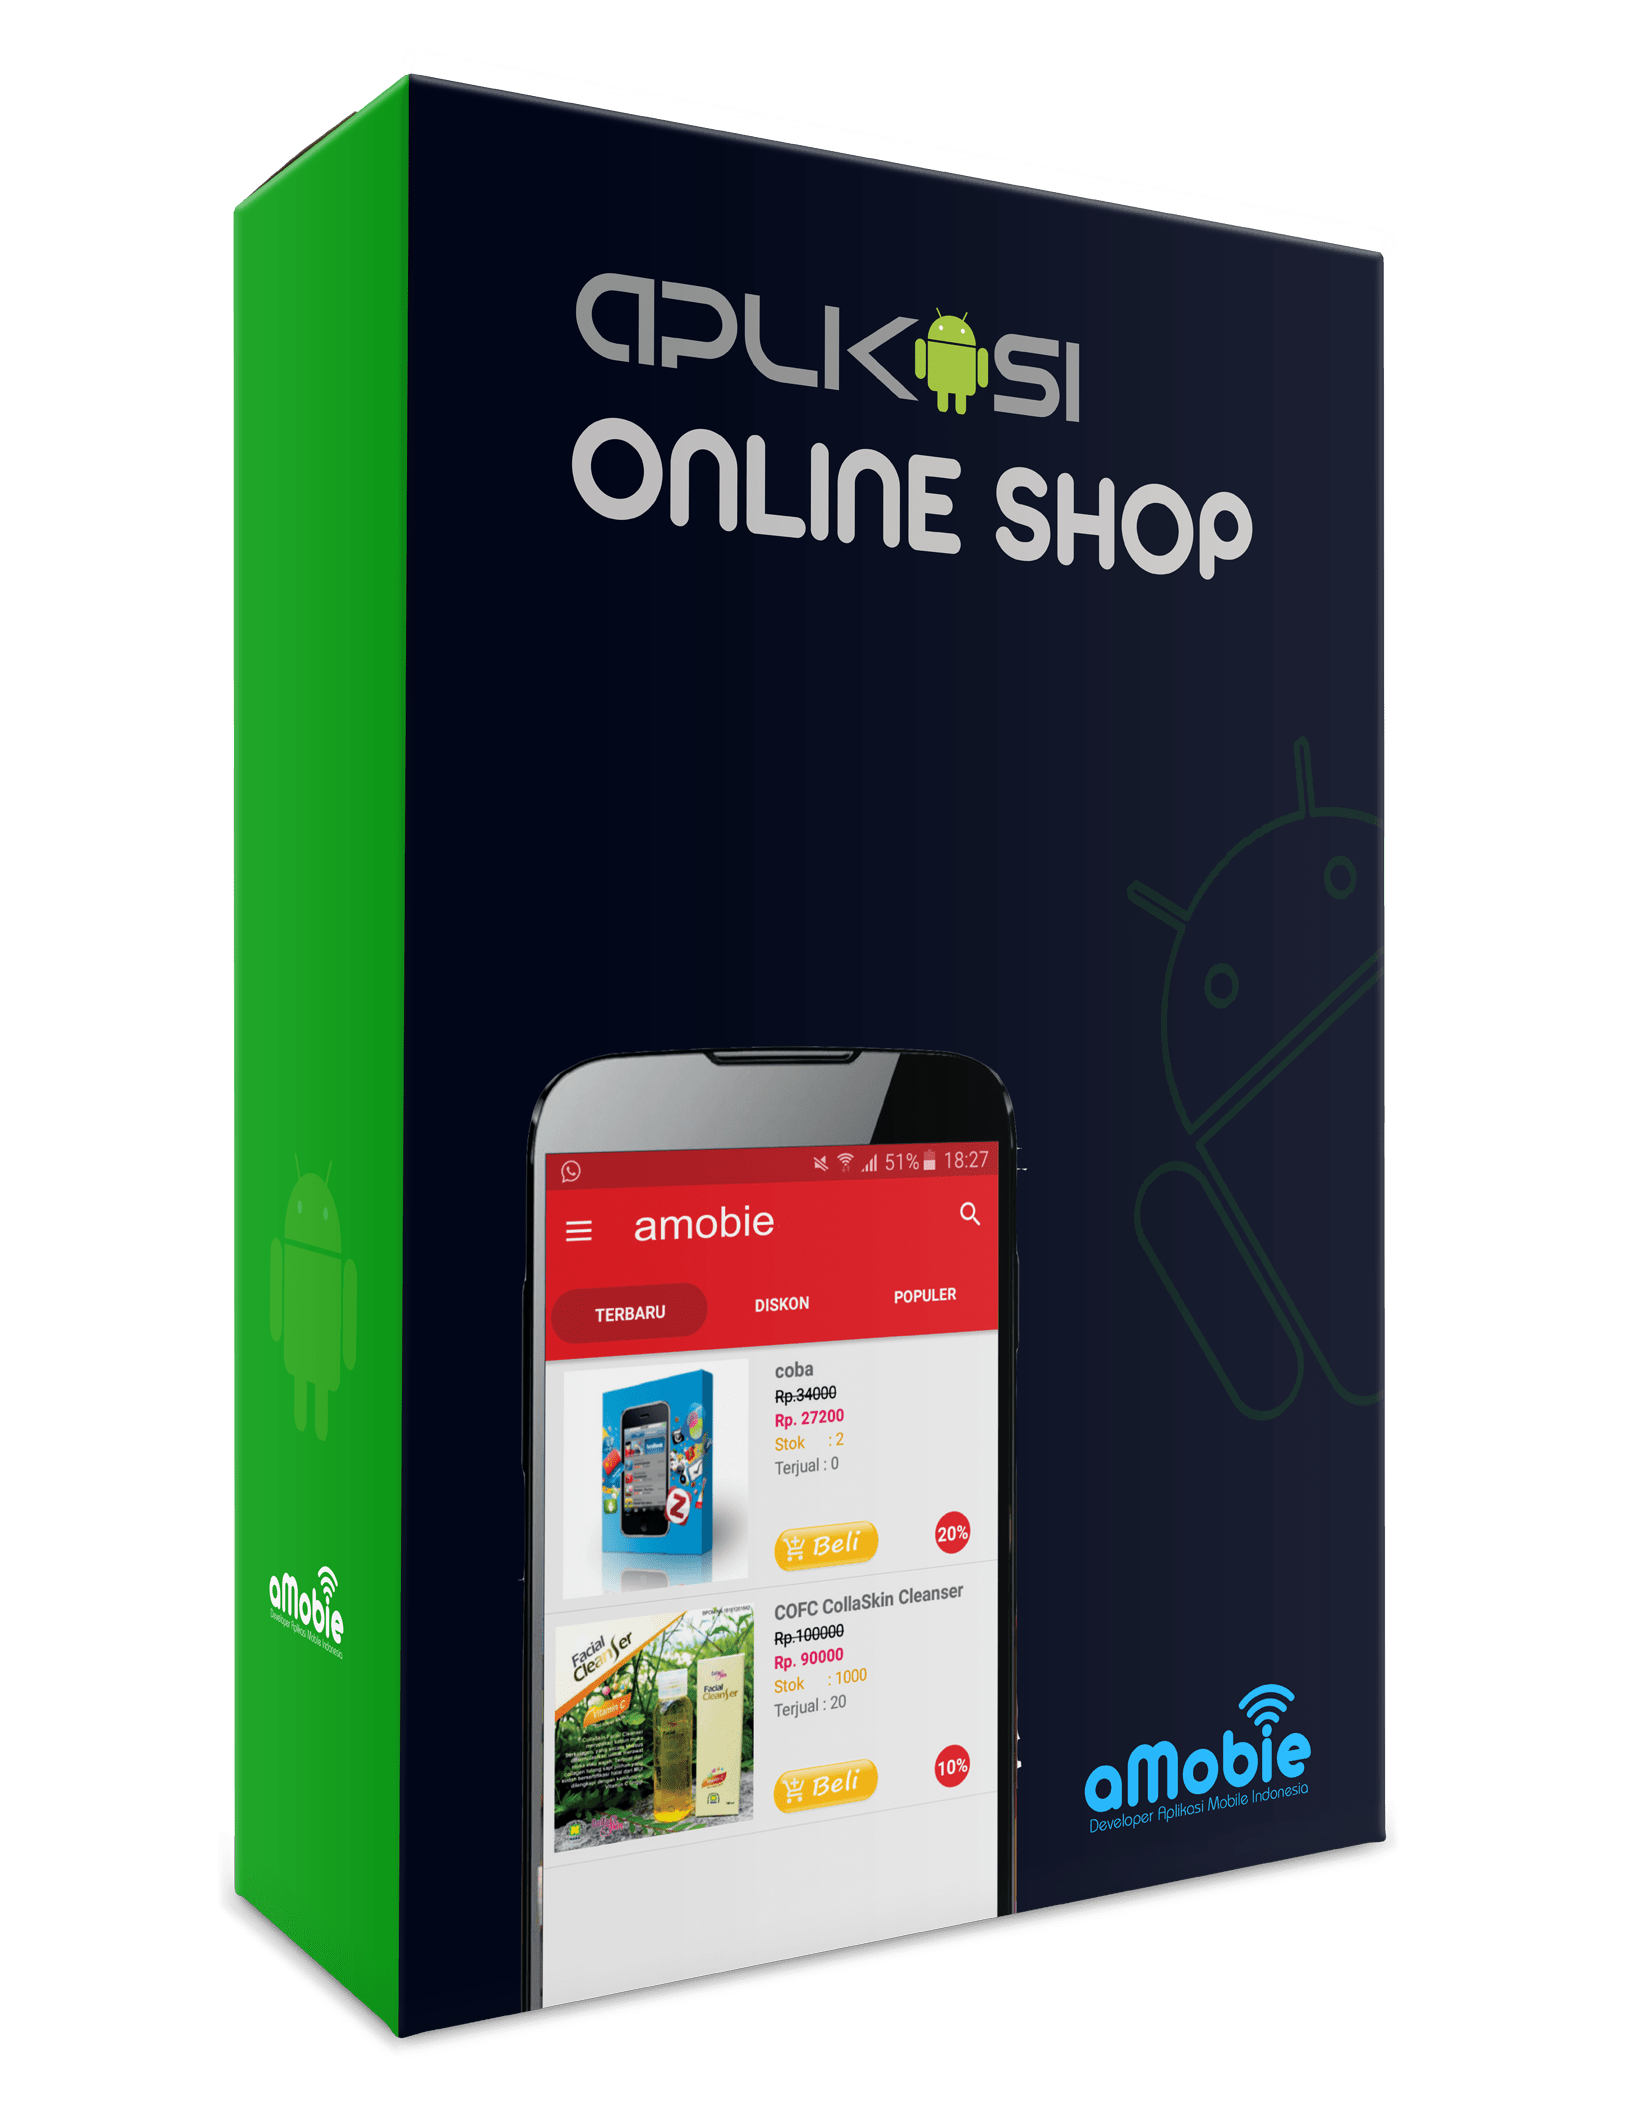 Https Indoim Com Aplikasi Android Onlineshop Cara Pembuatan Aplikasi Android Toko Online Olshop Murah Apk App Android Aplikasi Android Aplikasi Android